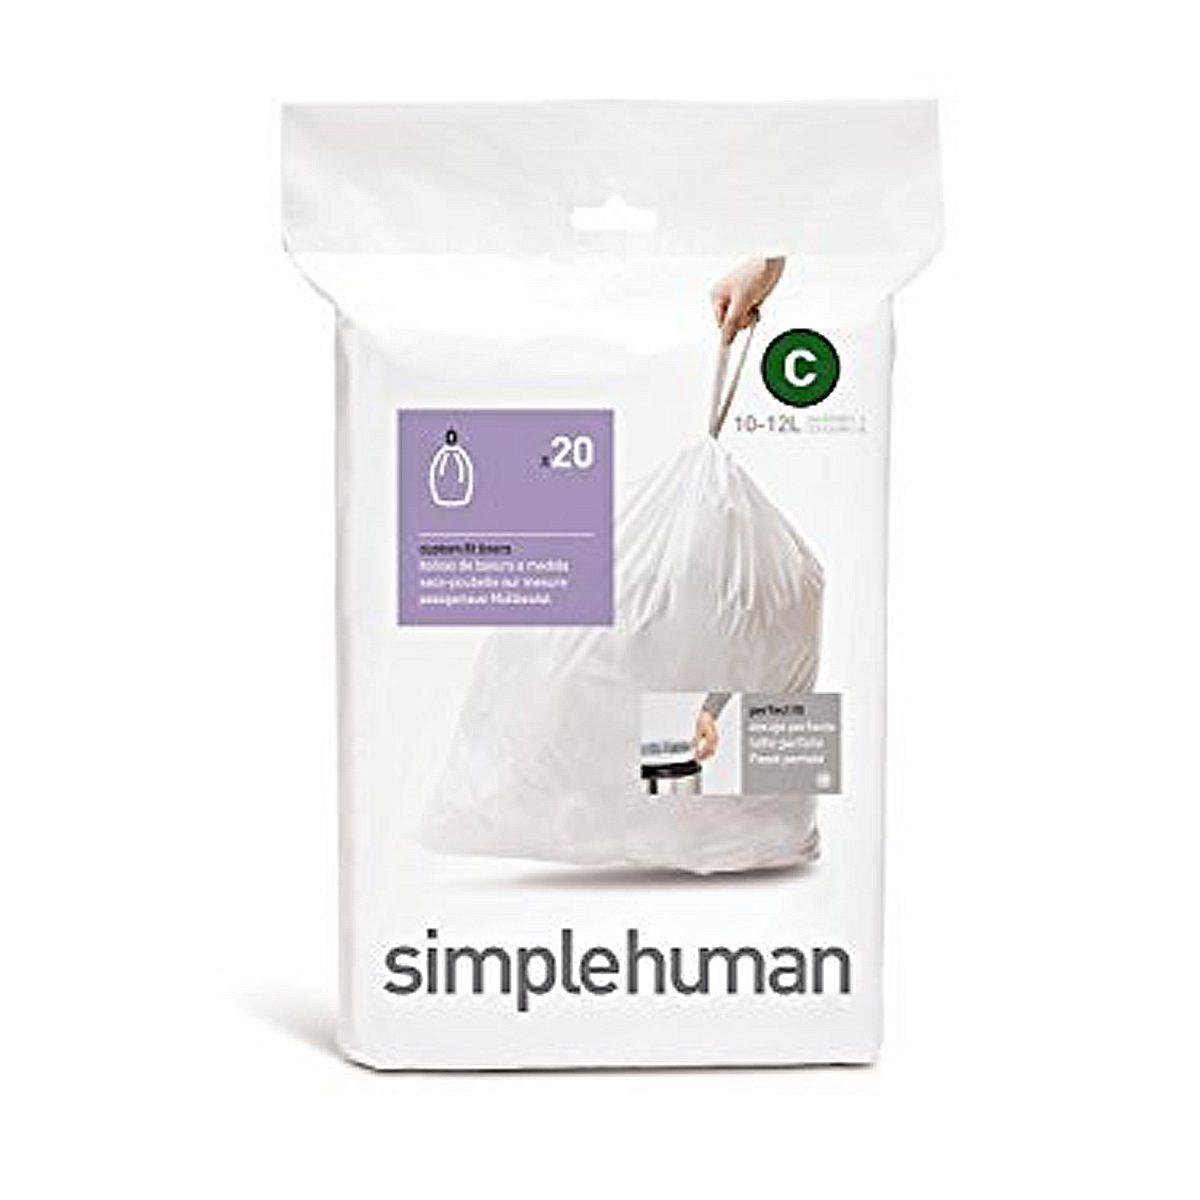 Simplehuman simplehuman 20 Abfallbeutel C 10 l